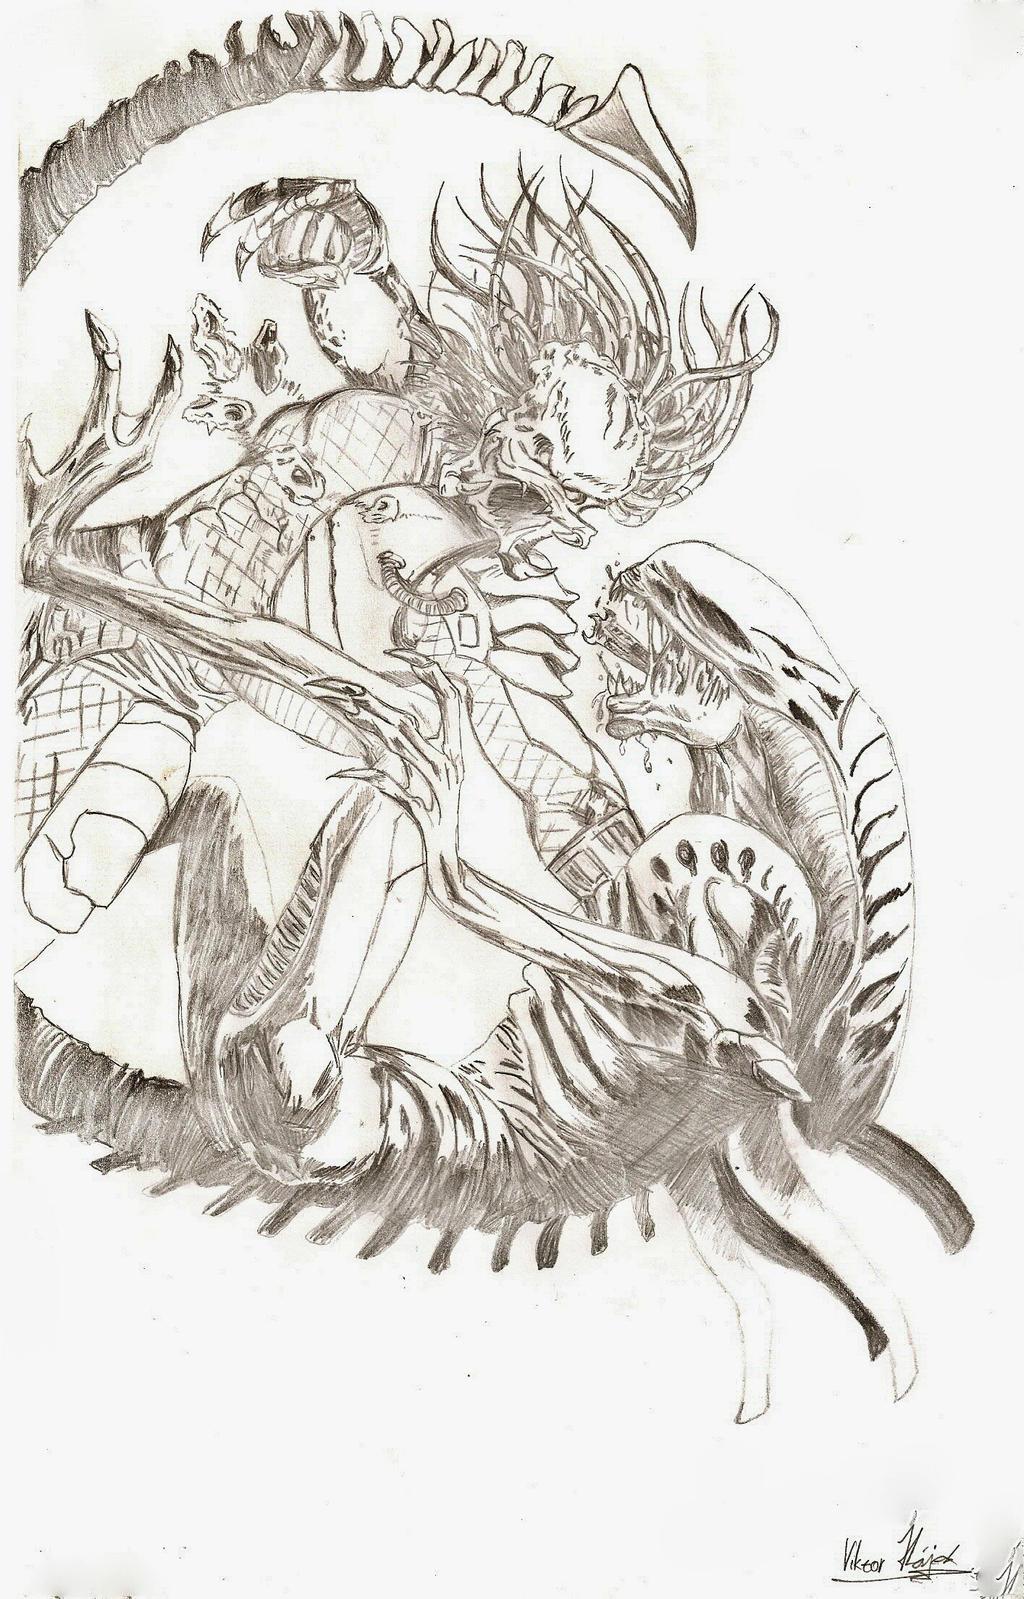 aliens vs predator drawings - photo #29